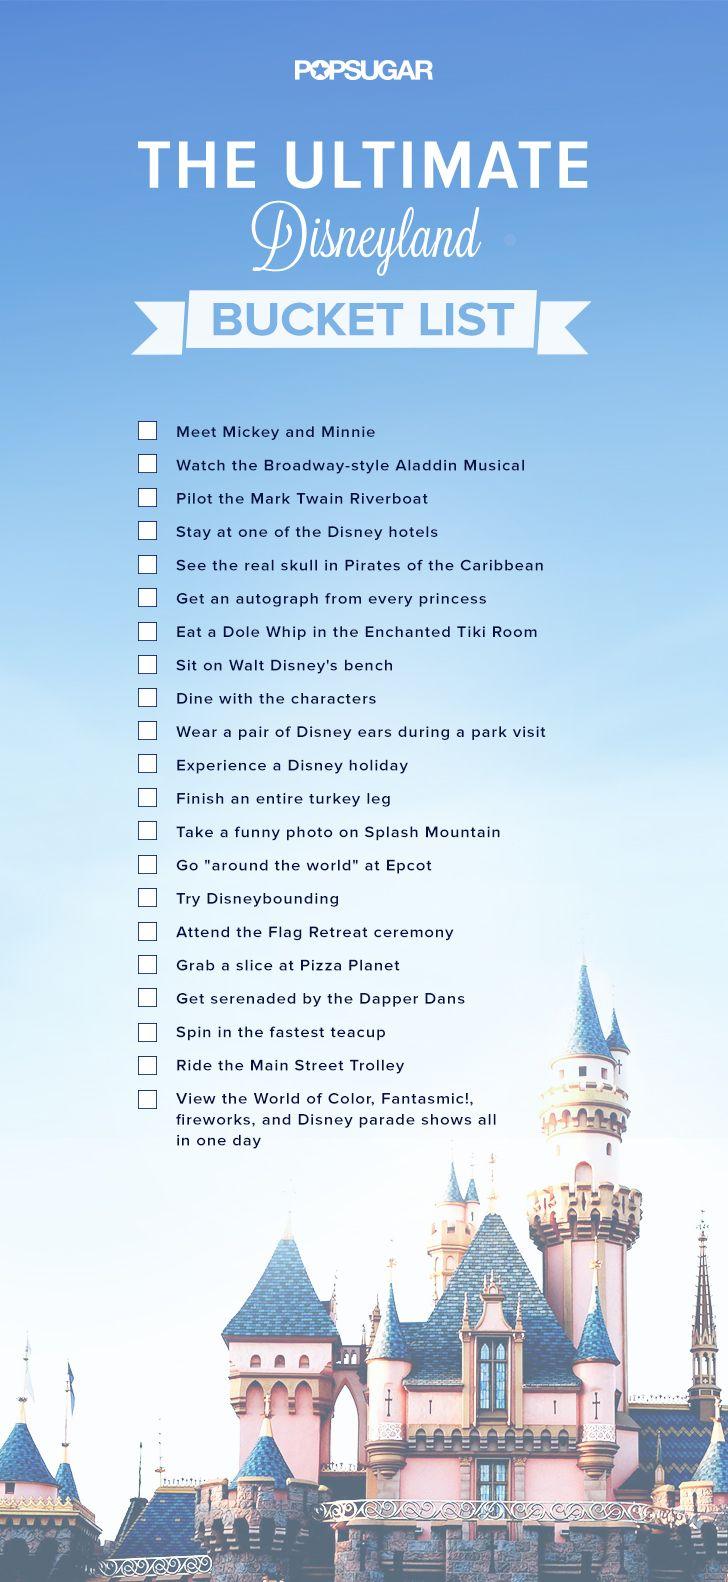 DisneyLand Bucket List